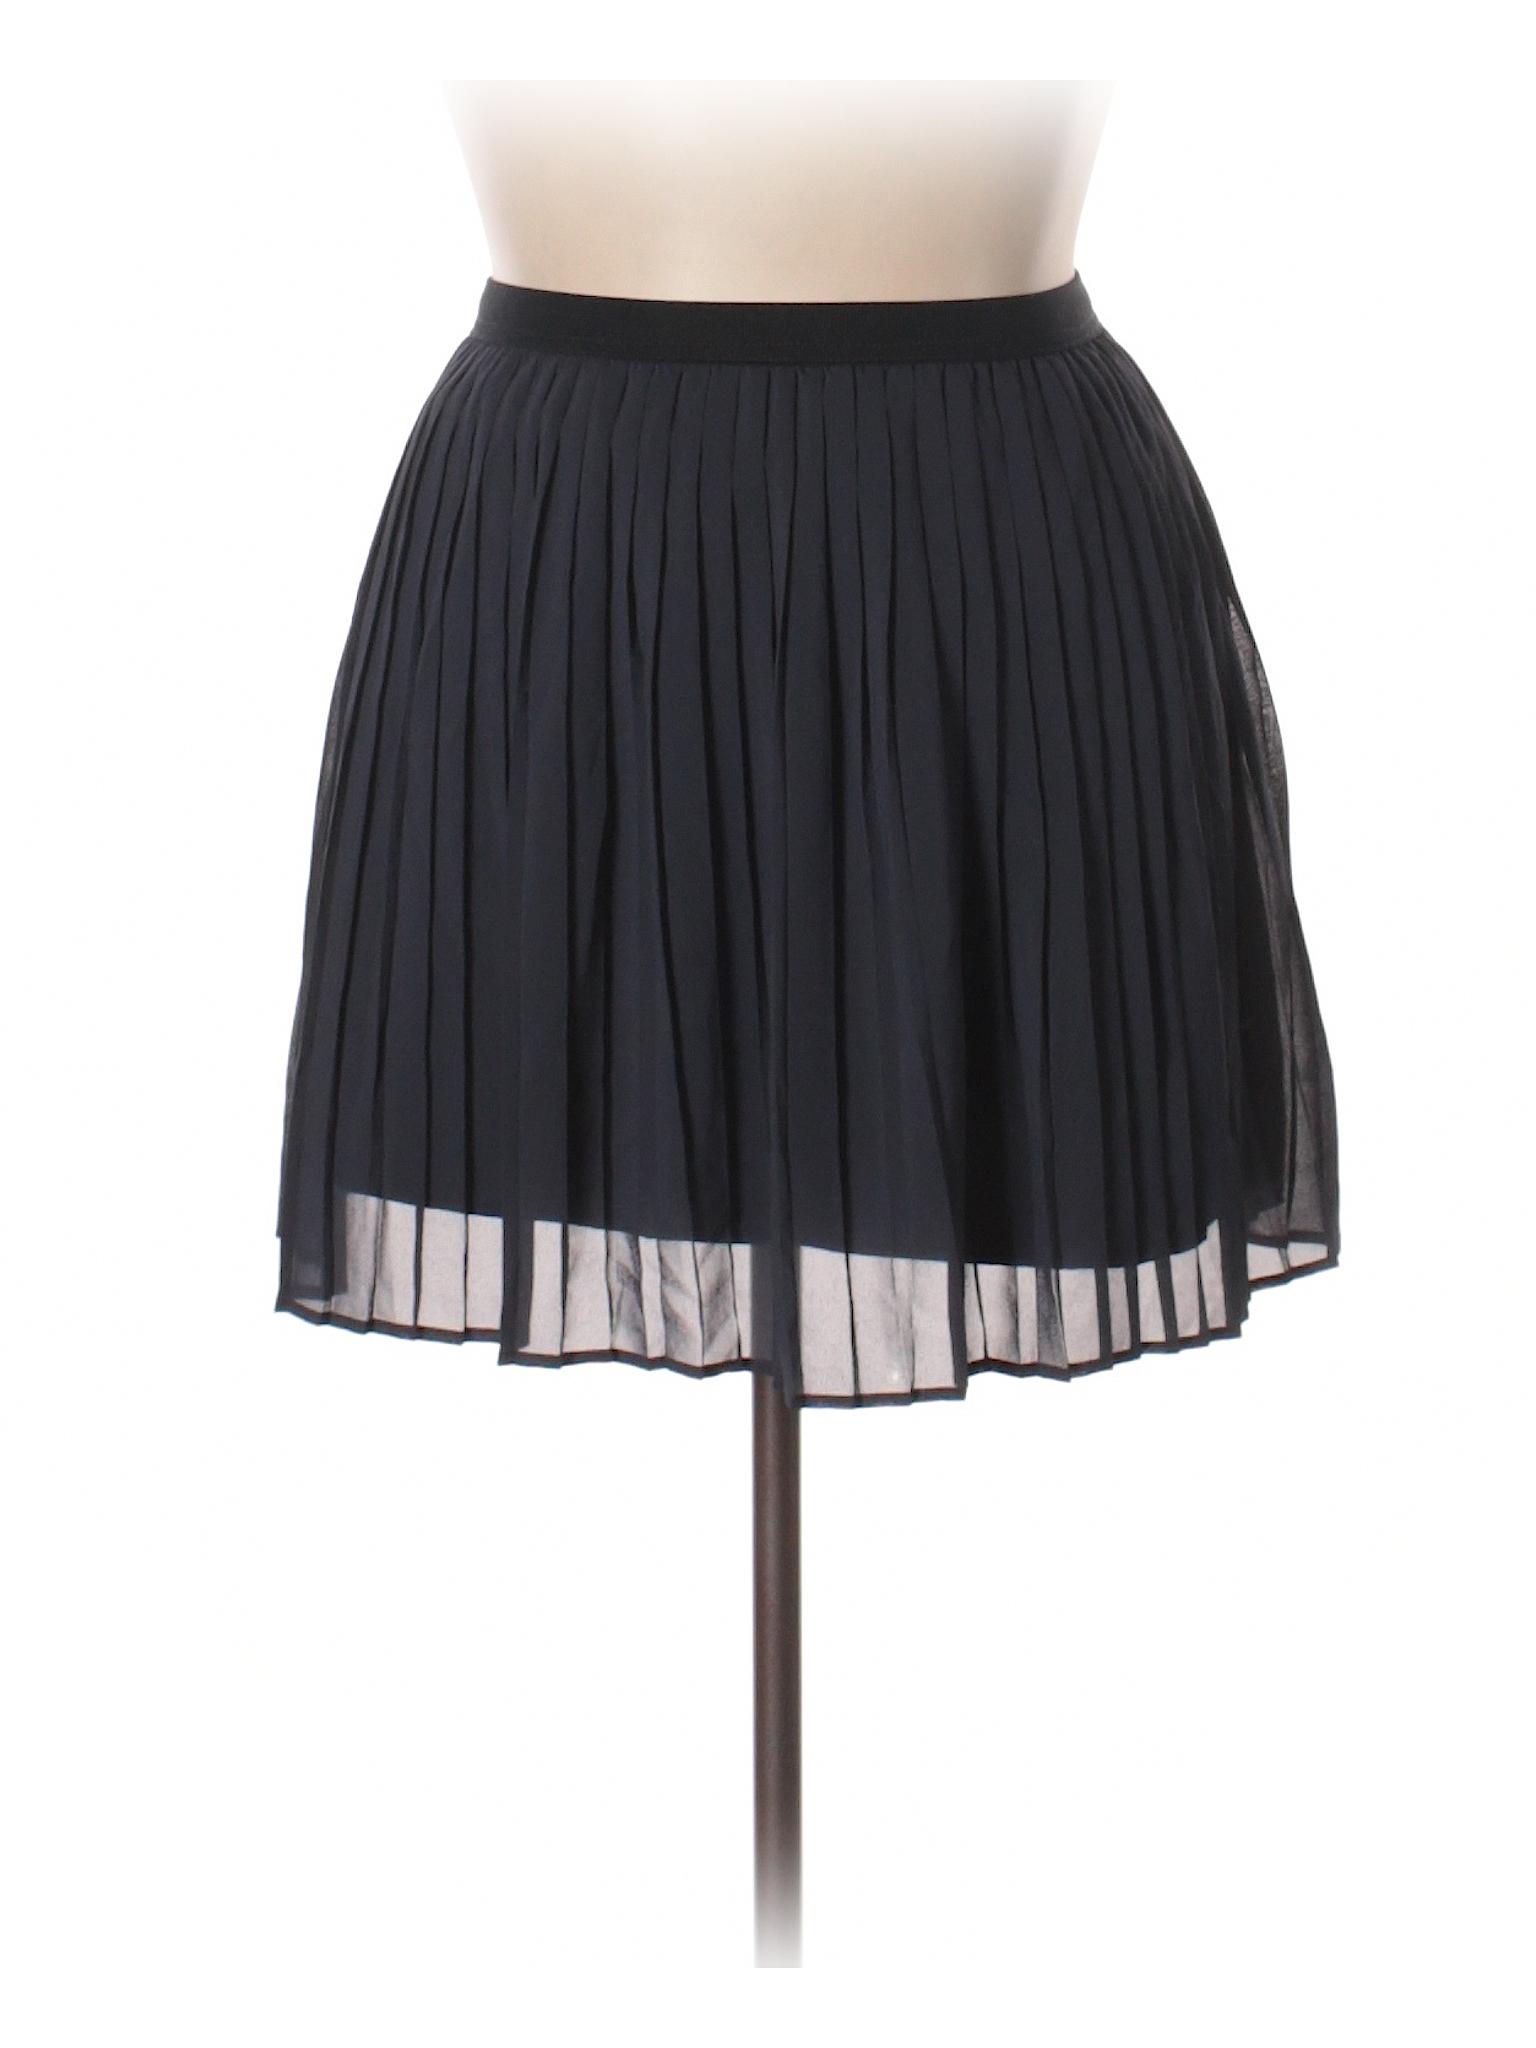 Skirt Boutique Boutique Skirt Skirt Casual Casual Boutique Boutique Casual xrrFR